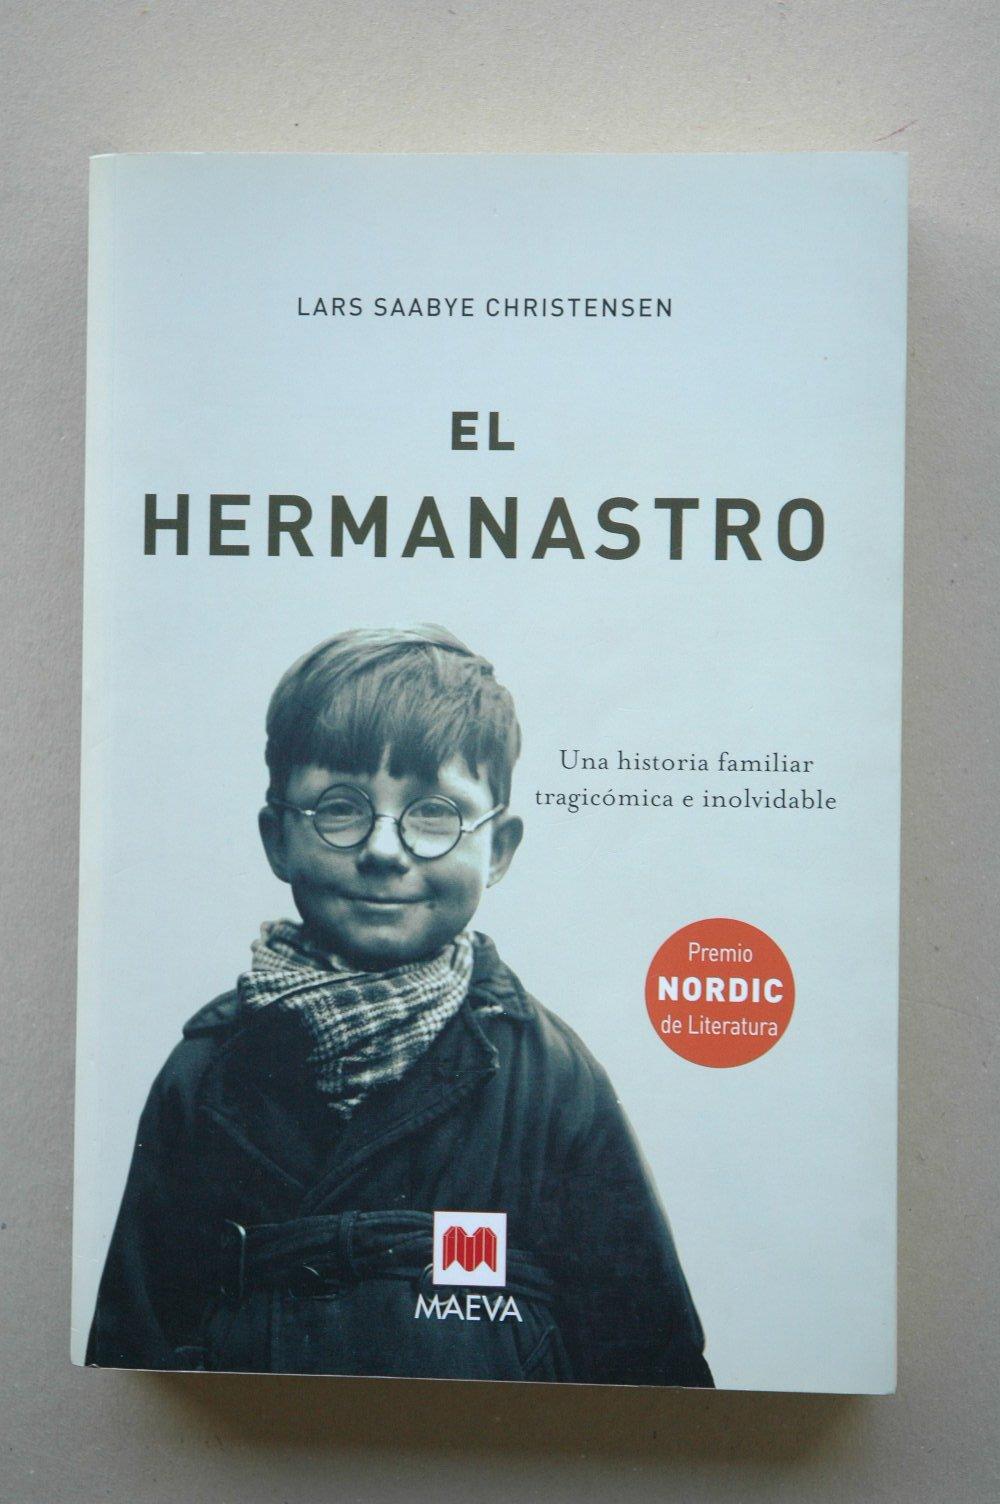 El hermanastro / Lars Saabye Christensen: Amazon.es: Lars ...